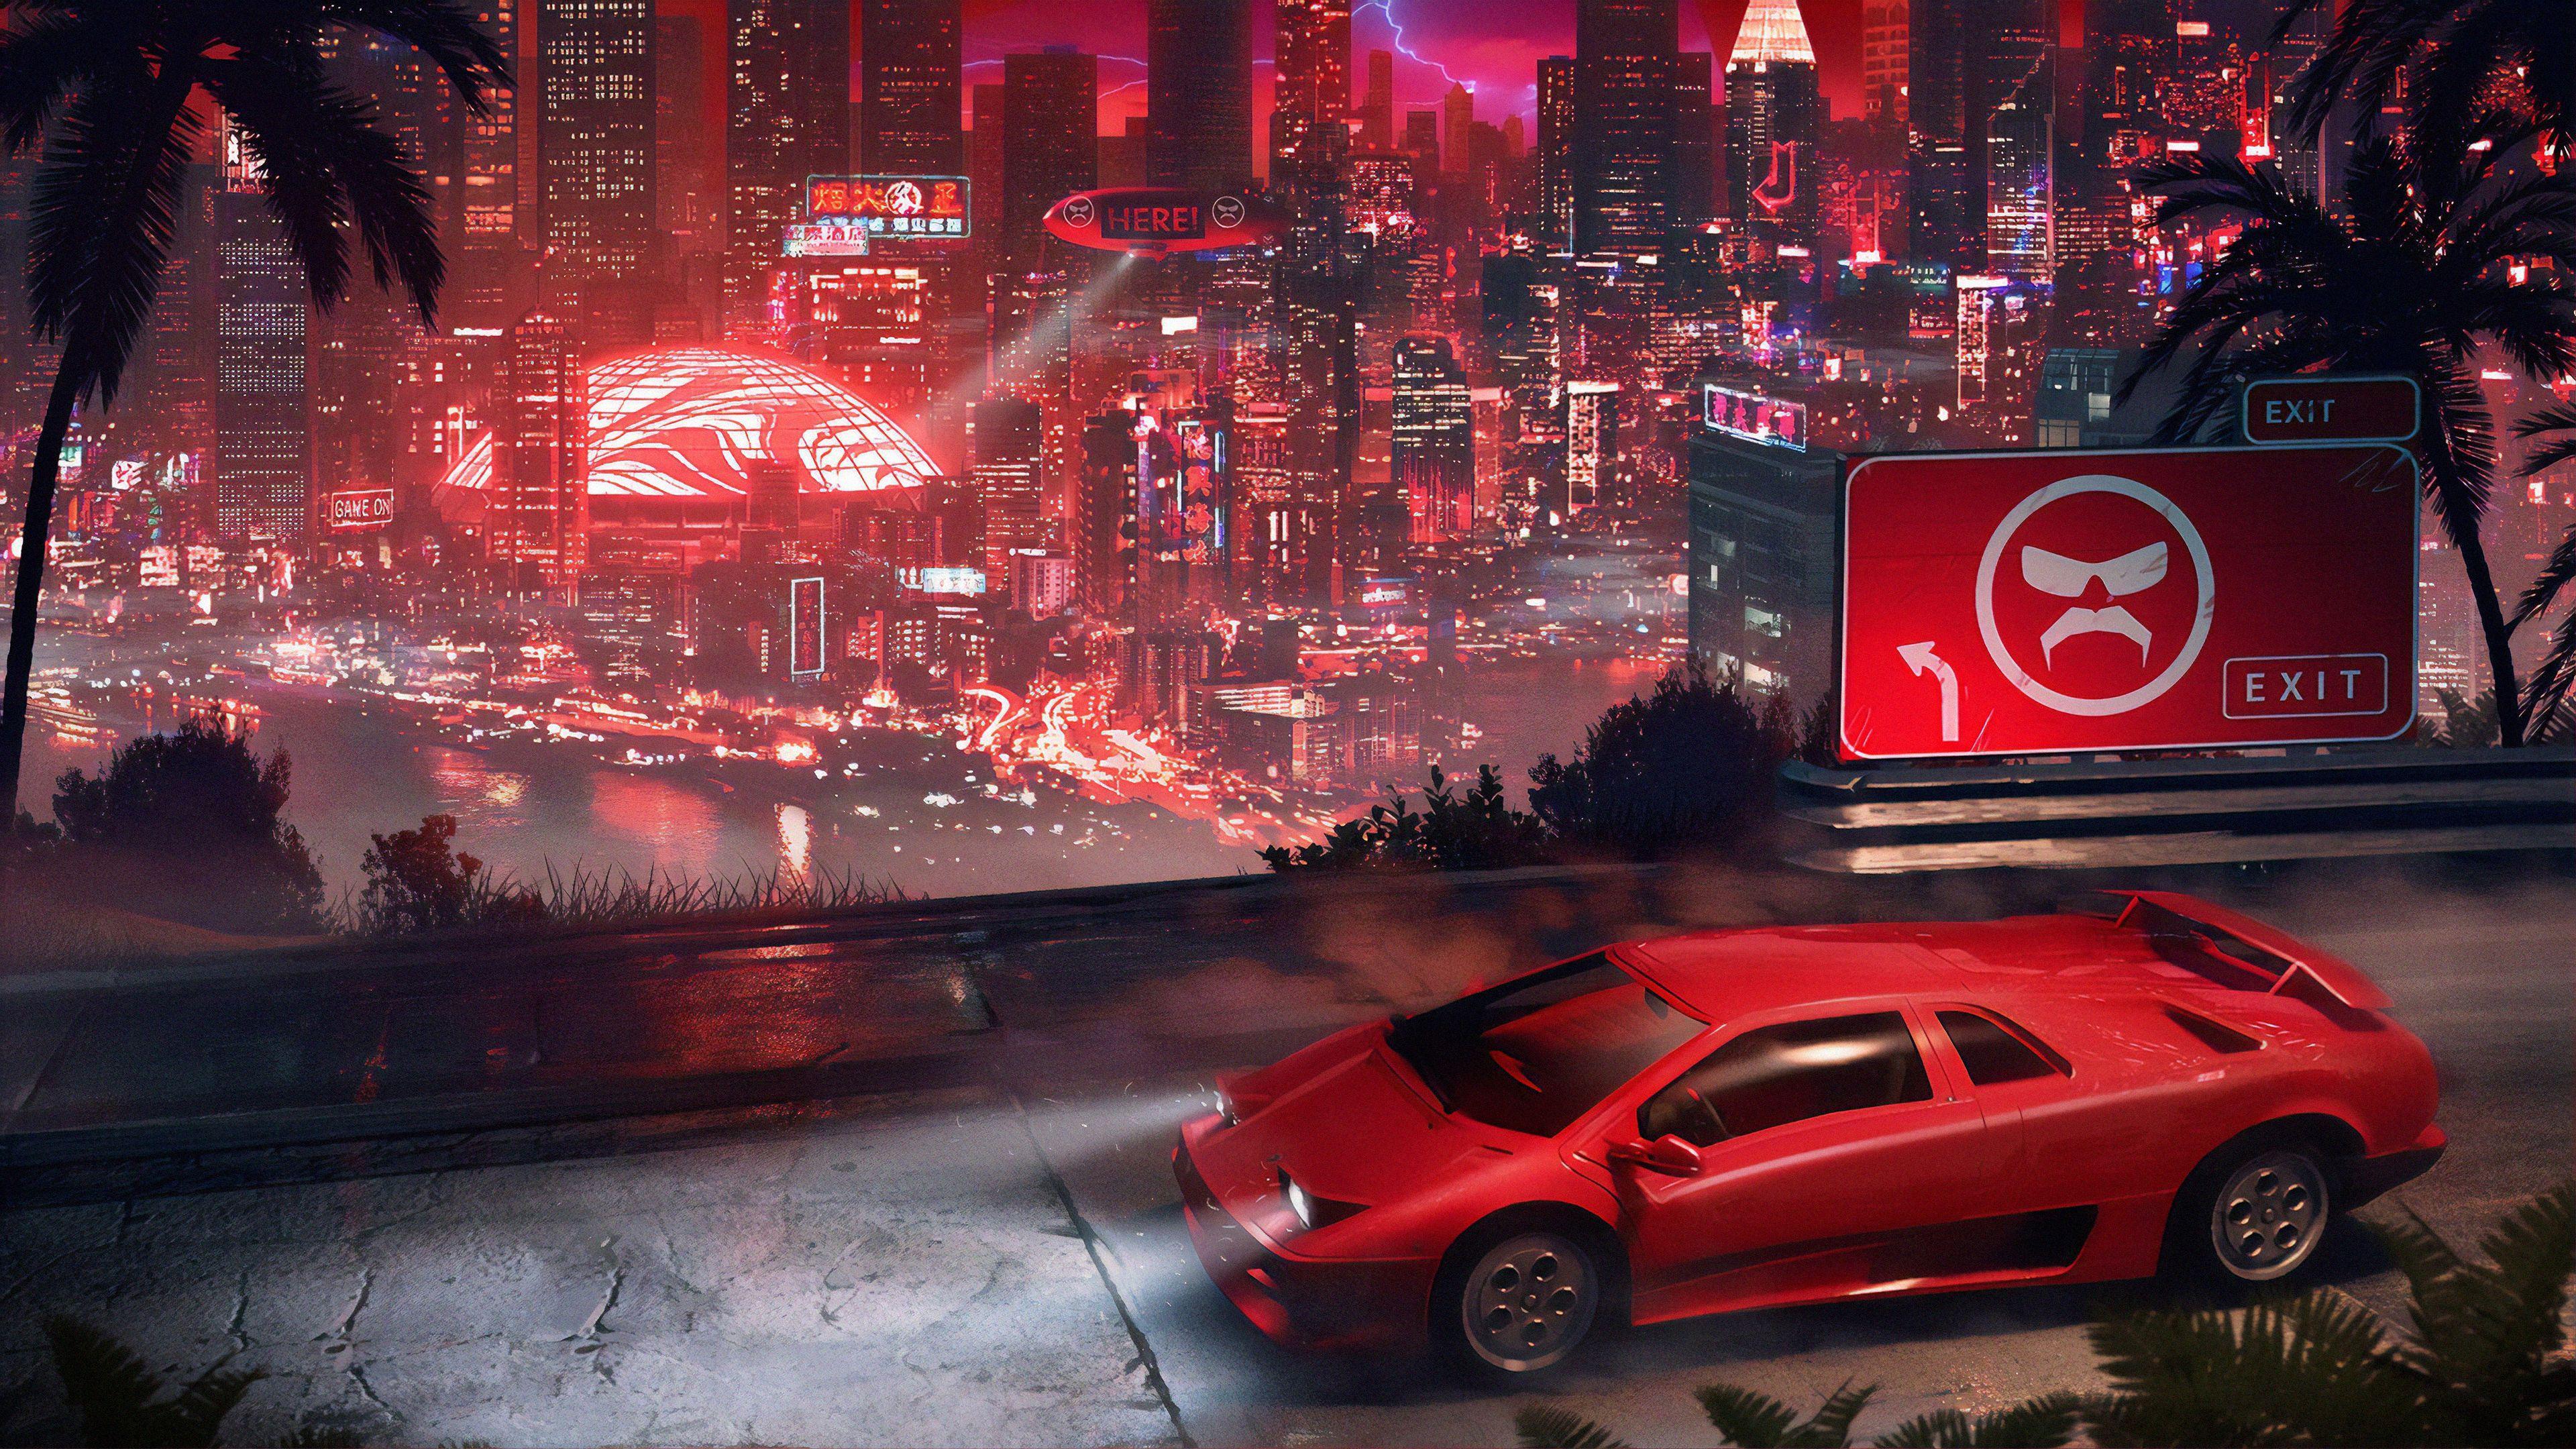 Cyberpunk Red Wallpapers - Top Free Cyberpunk Red ...